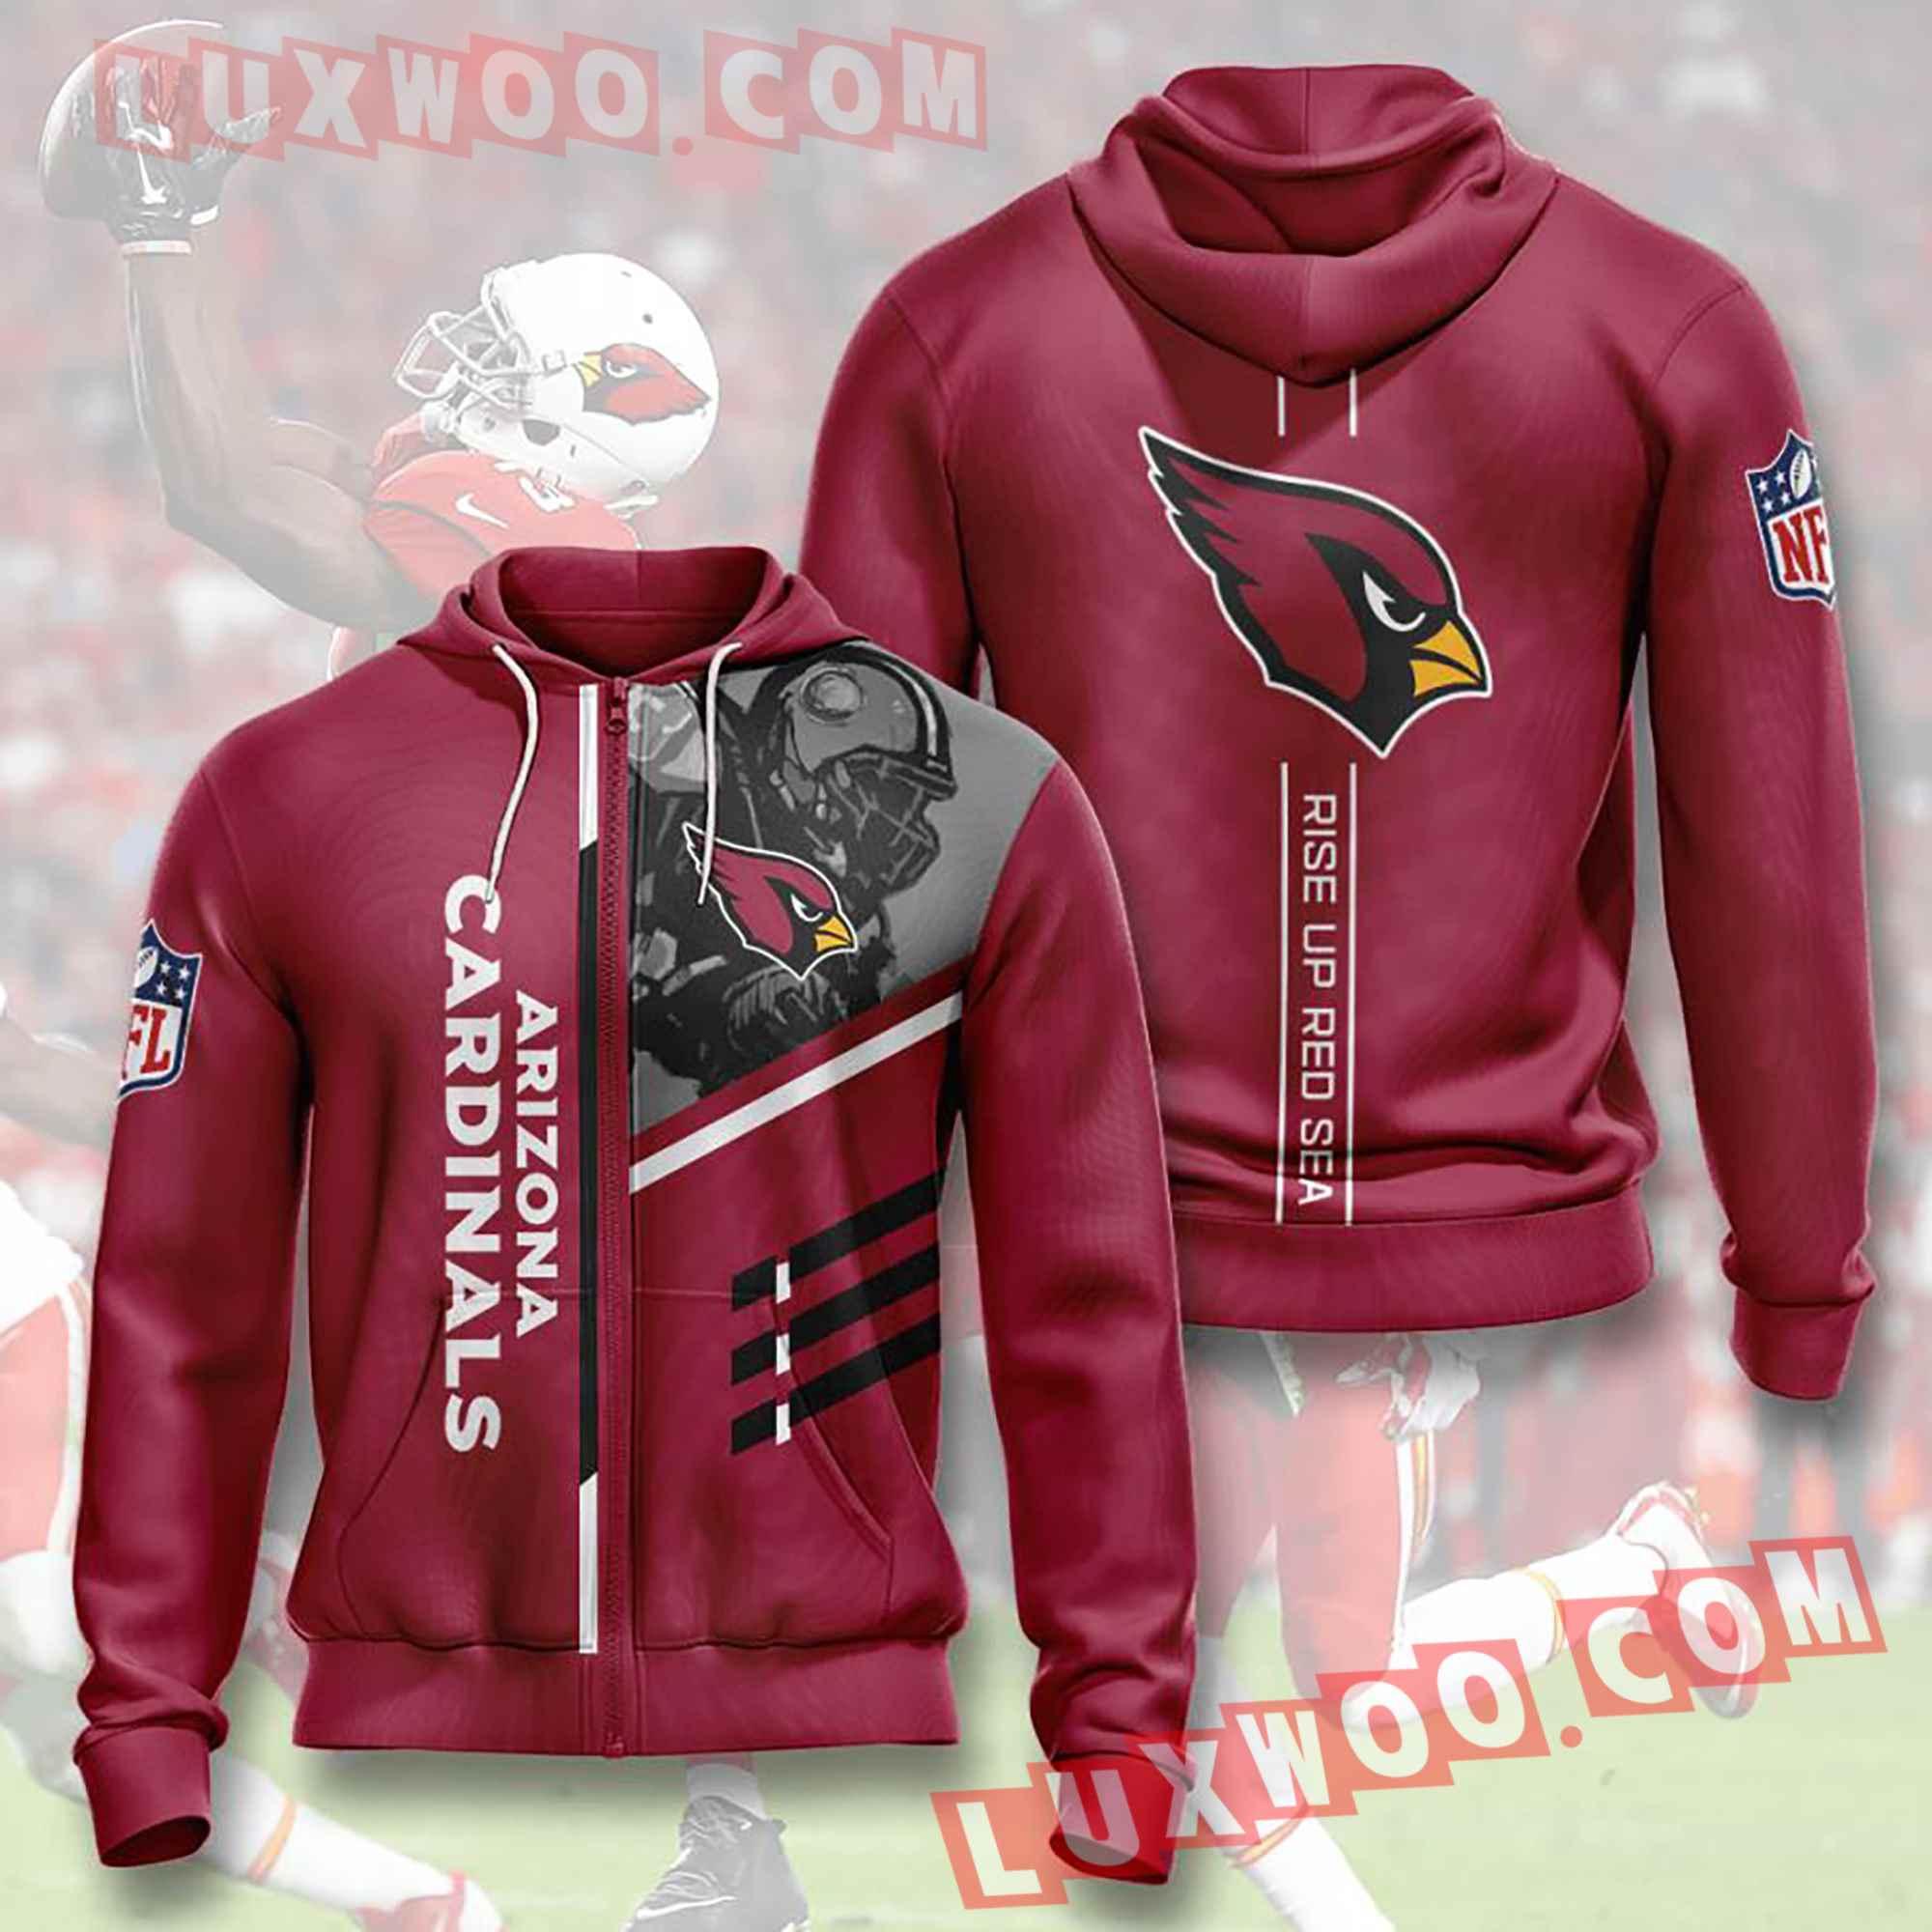 Nfl Arizona Cardinals Hoodies Custom All Over Print 3d Pullover Hoodie V34